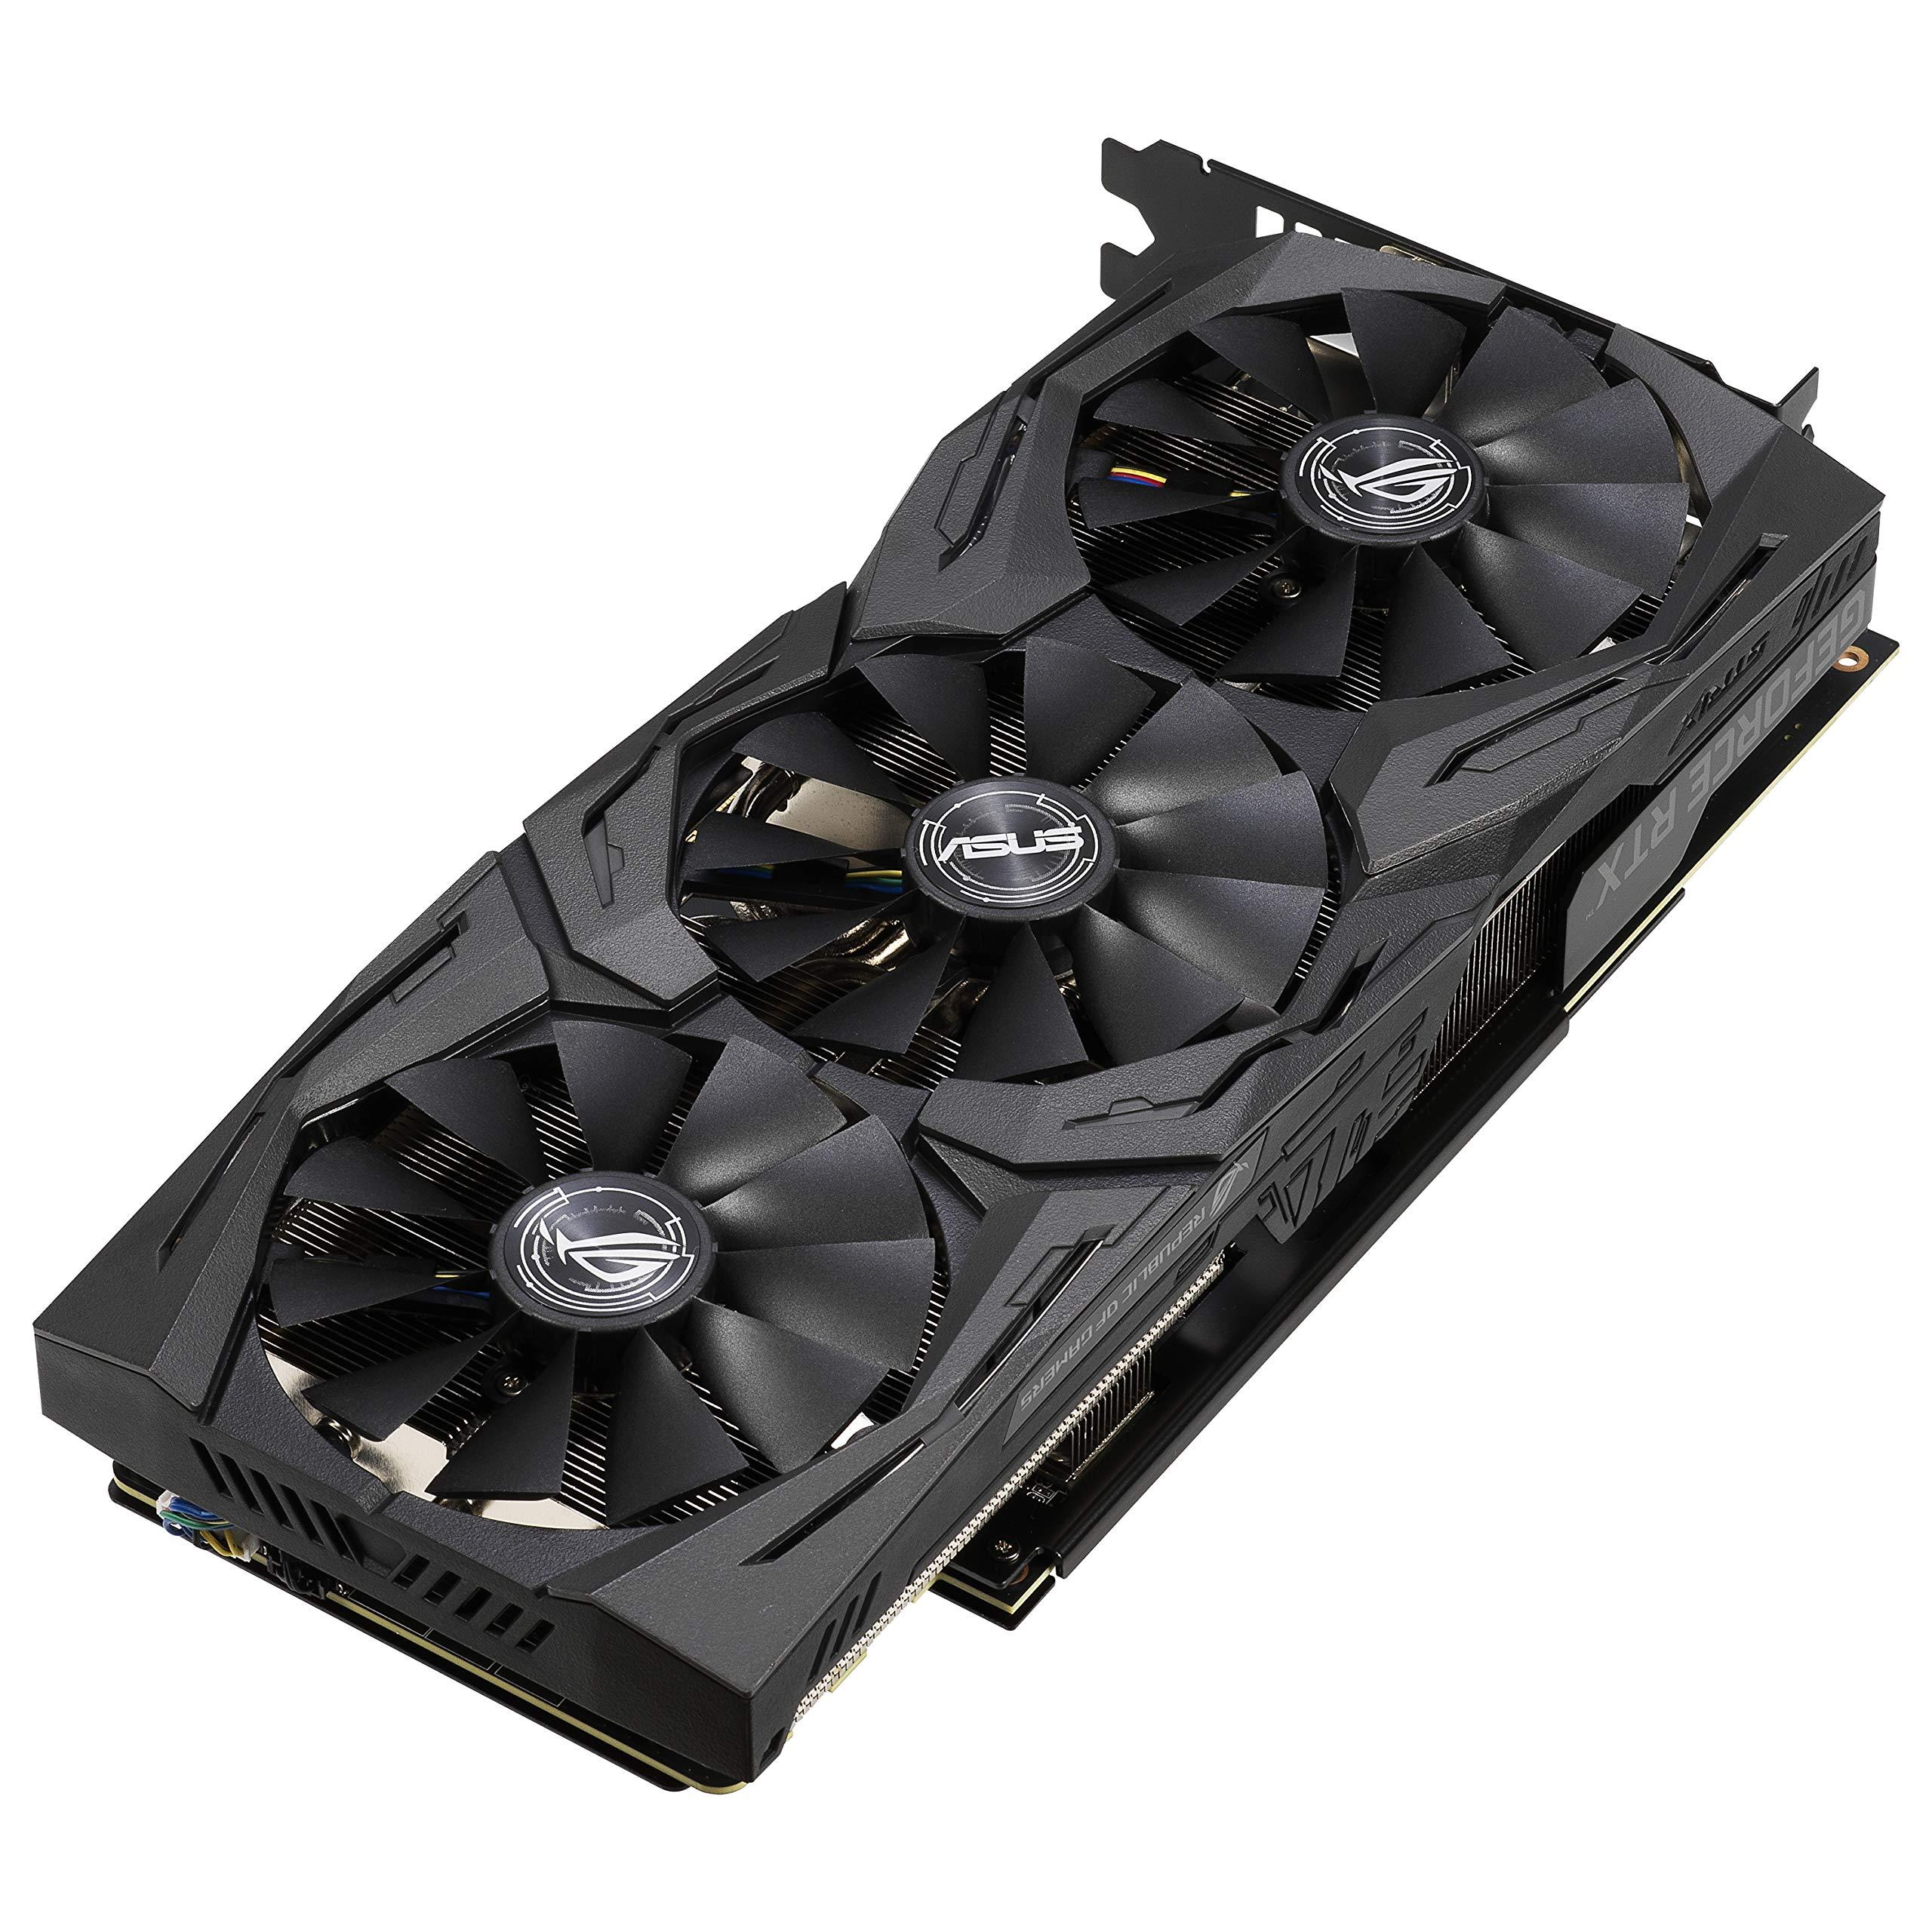 ASUS ROG Strix GeForce RTX 2060 Overclocked 6G GDDR6 HDMI DP 1.4 Gaming Graphics Card (ROG-STRIX-RTX-2060-O6G) by ASUS (Image #3)